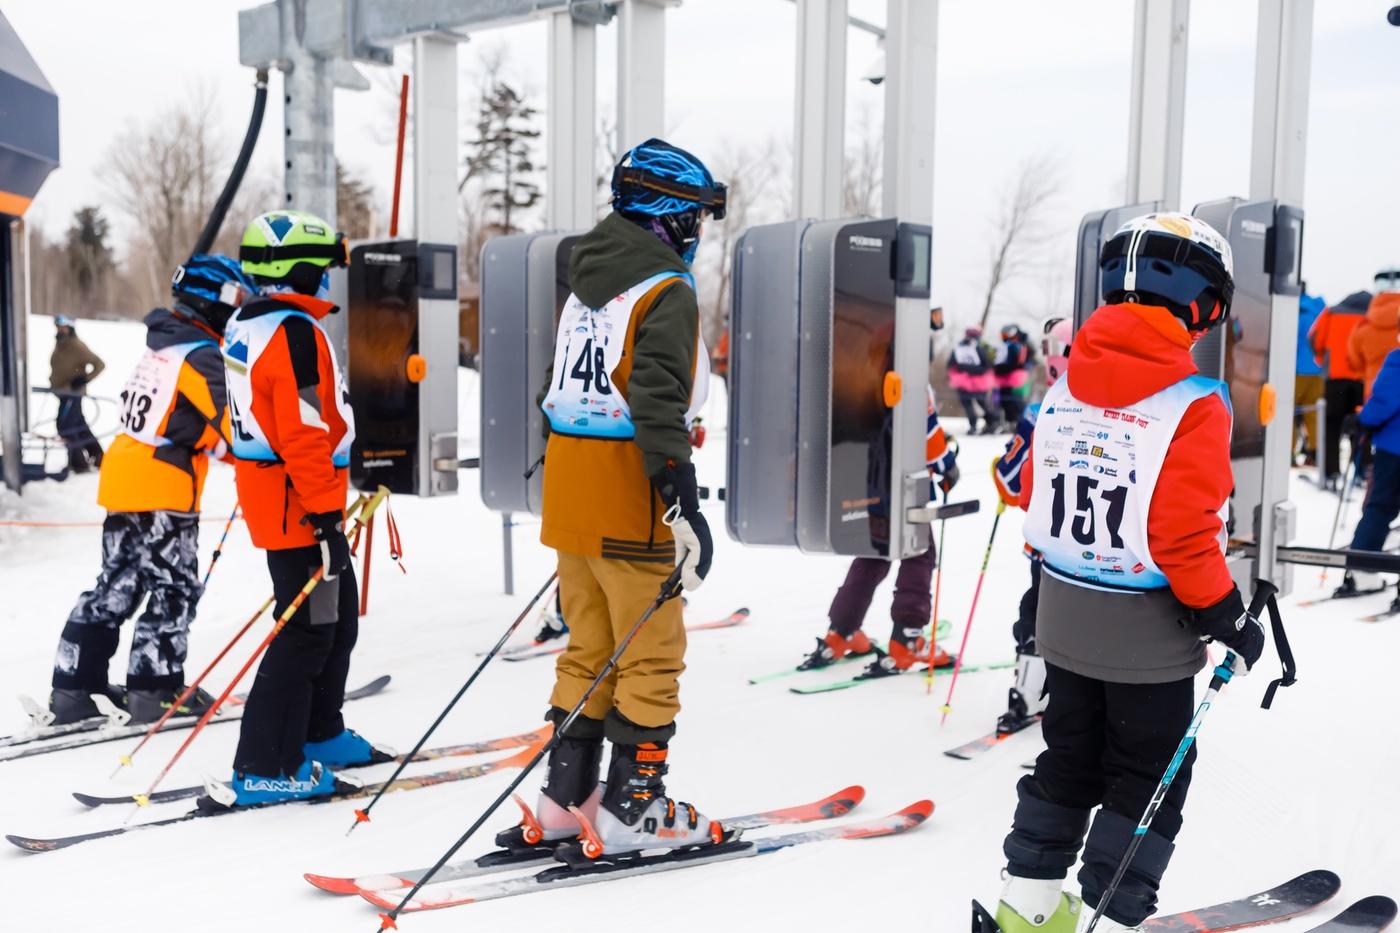 WinterKids Downhill 24 2021 SDP 2704